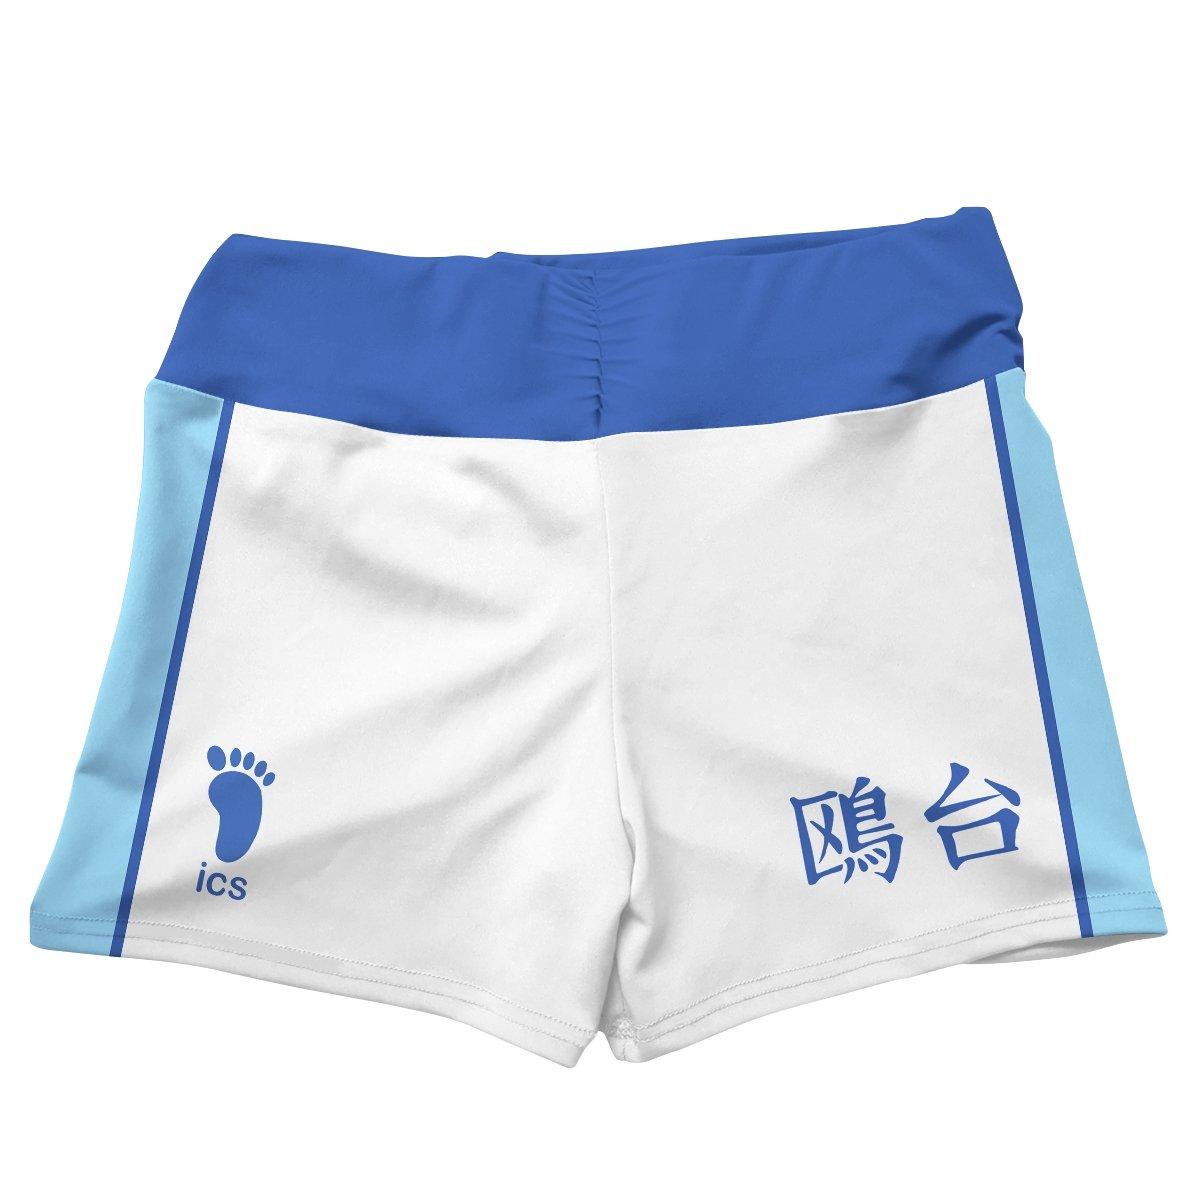 team kamomedai active wear set 762799 - Anime Swimsuits